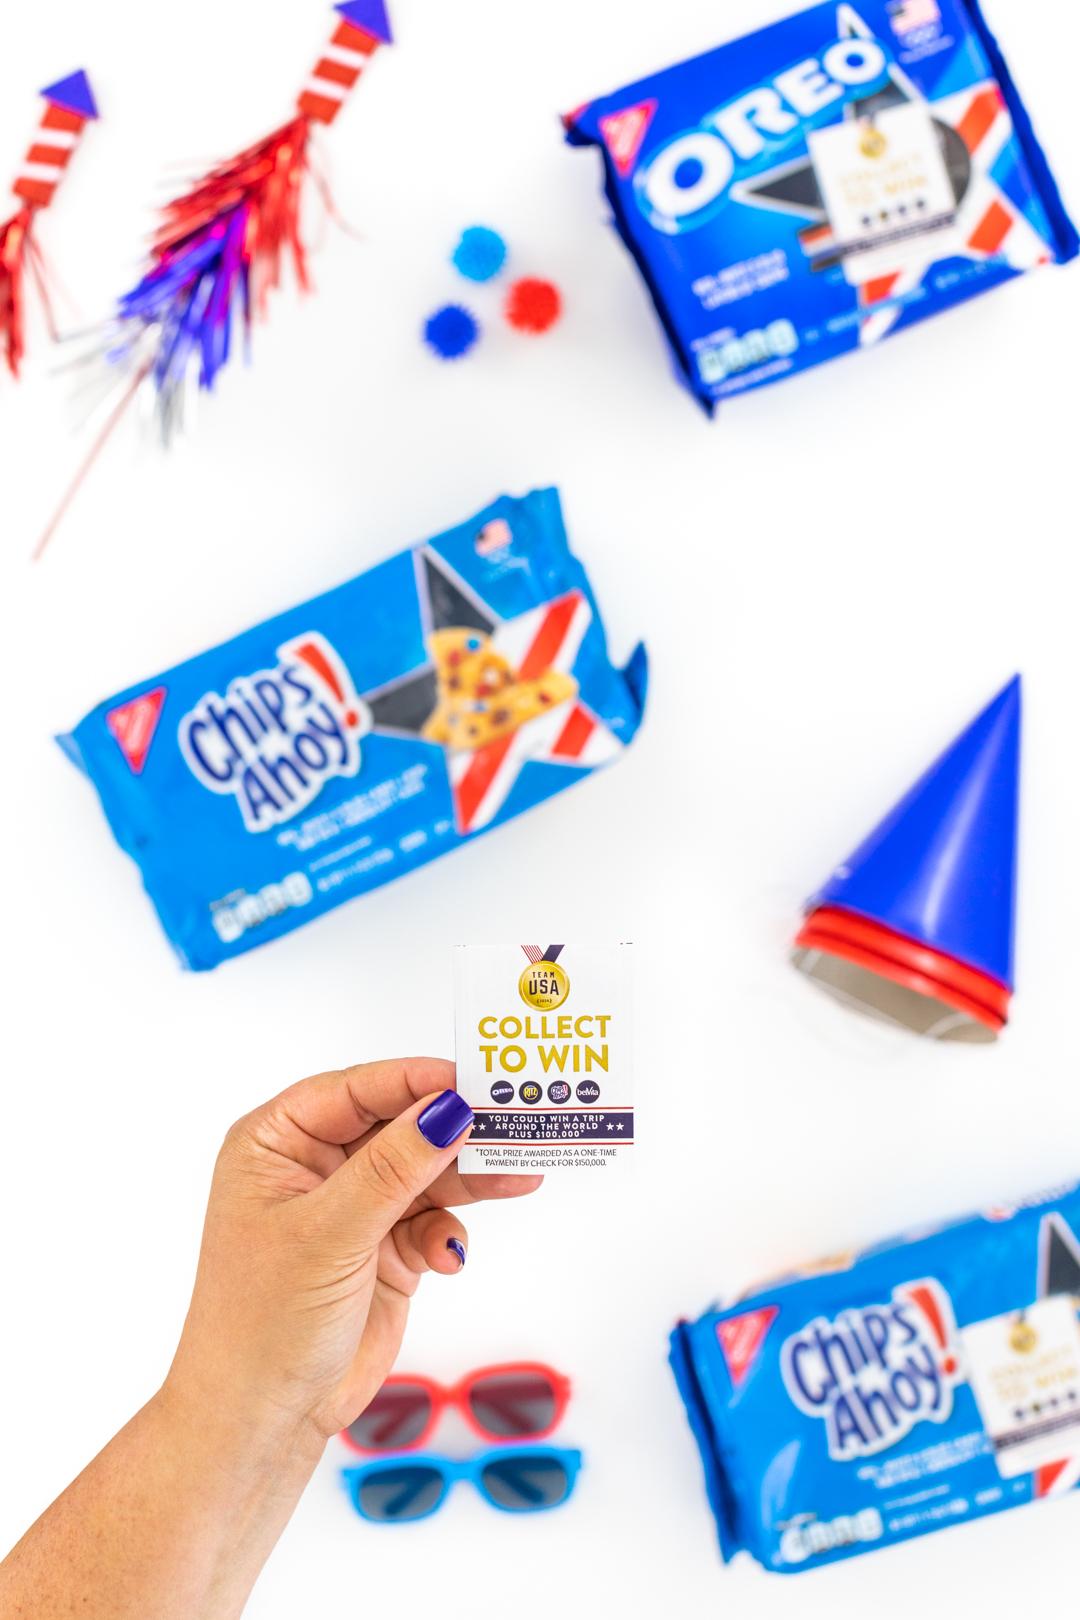 peeling off sweepstakes advertisement from cookie package